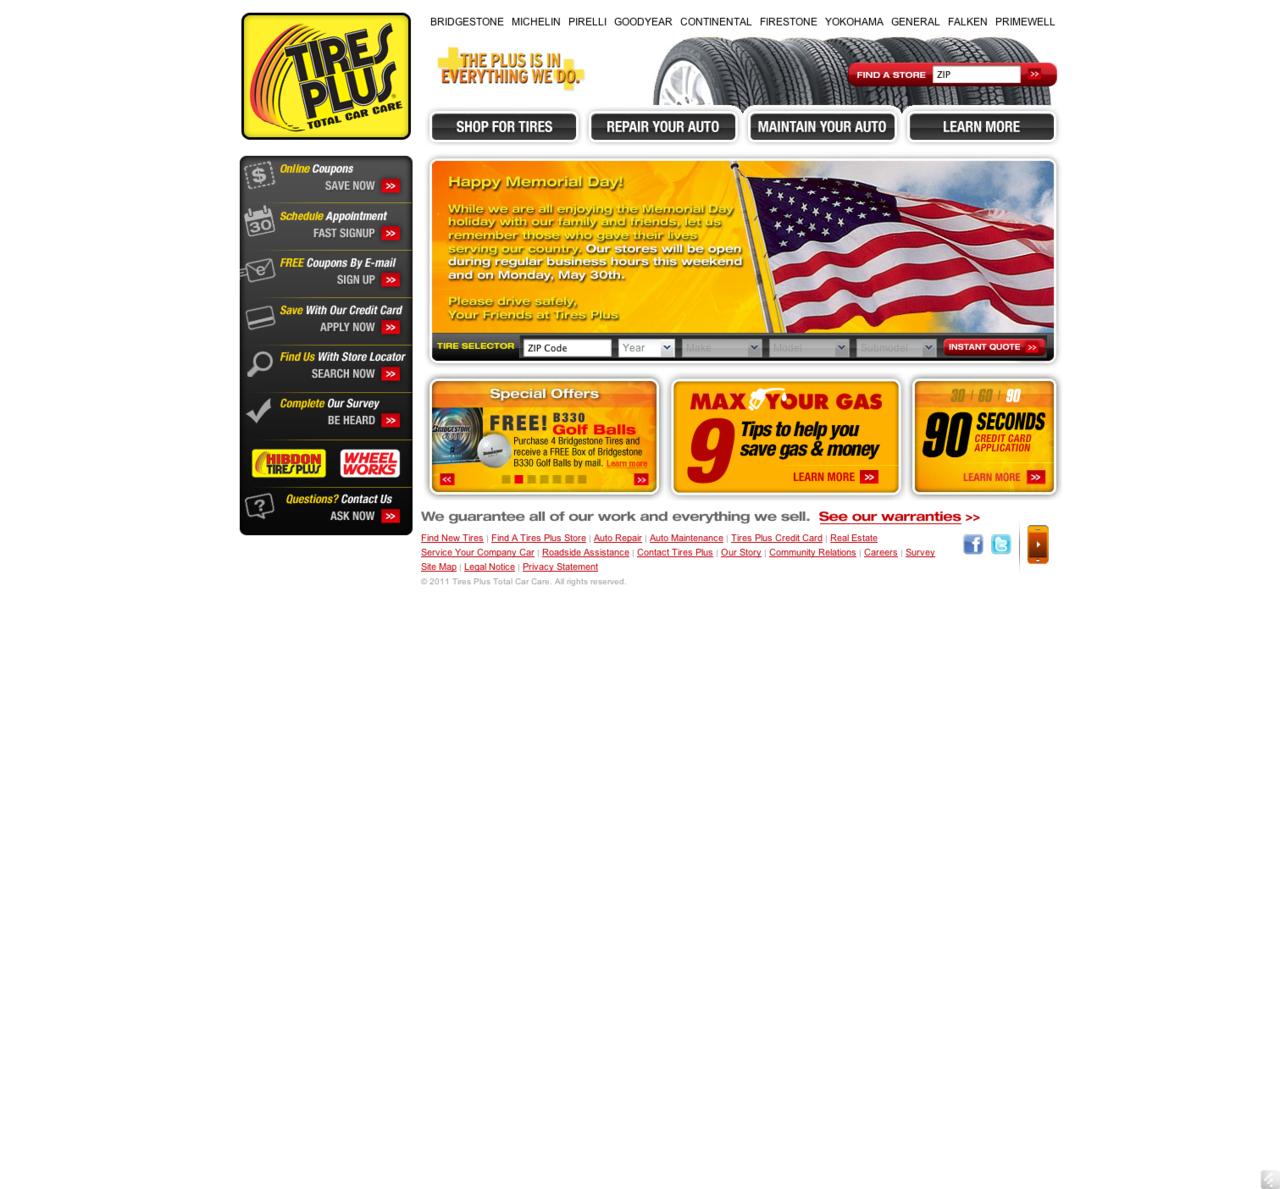 www.tiresplus.com